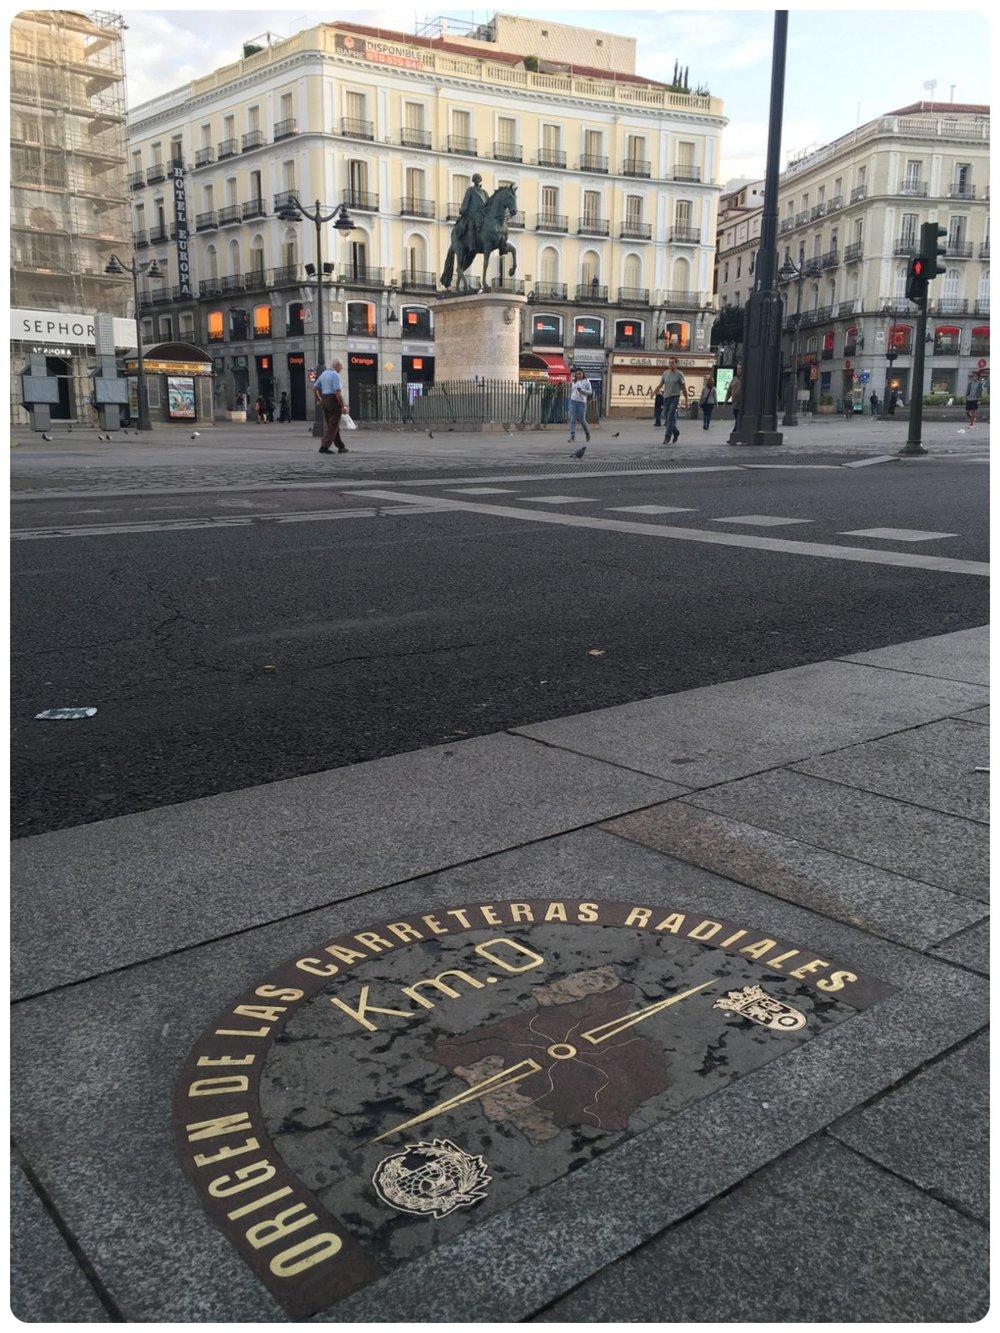 Kilometer Zero in Puerta del Sol, Madrid, Spain.